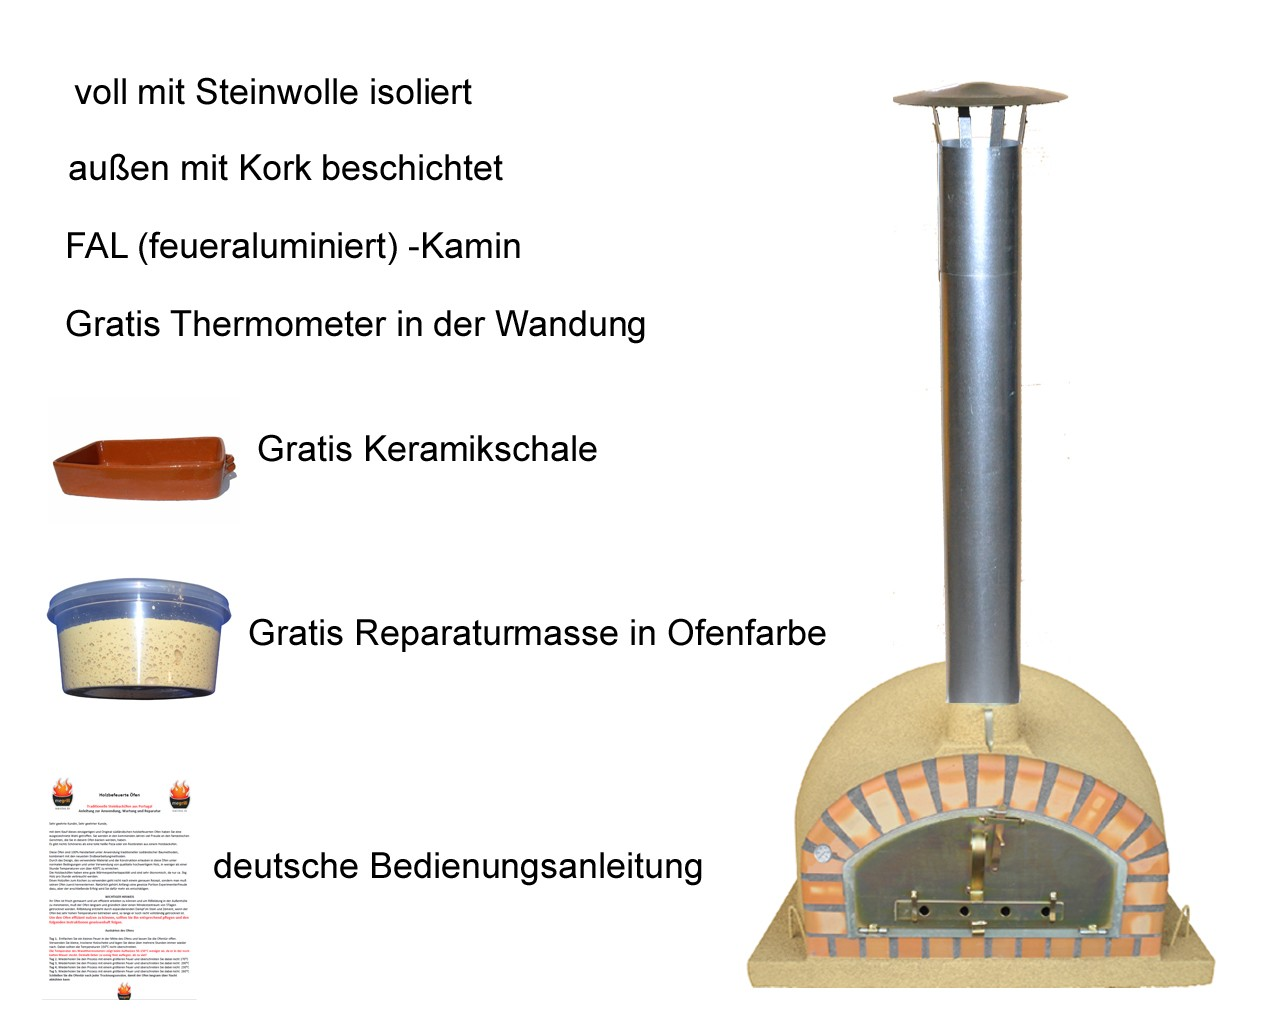 Impexfire Holzbefeuerter Pizzaofen Pizzaioli, Steinbackofen 100 creme-farben inkl Kamin... pizzaioli100creme.6